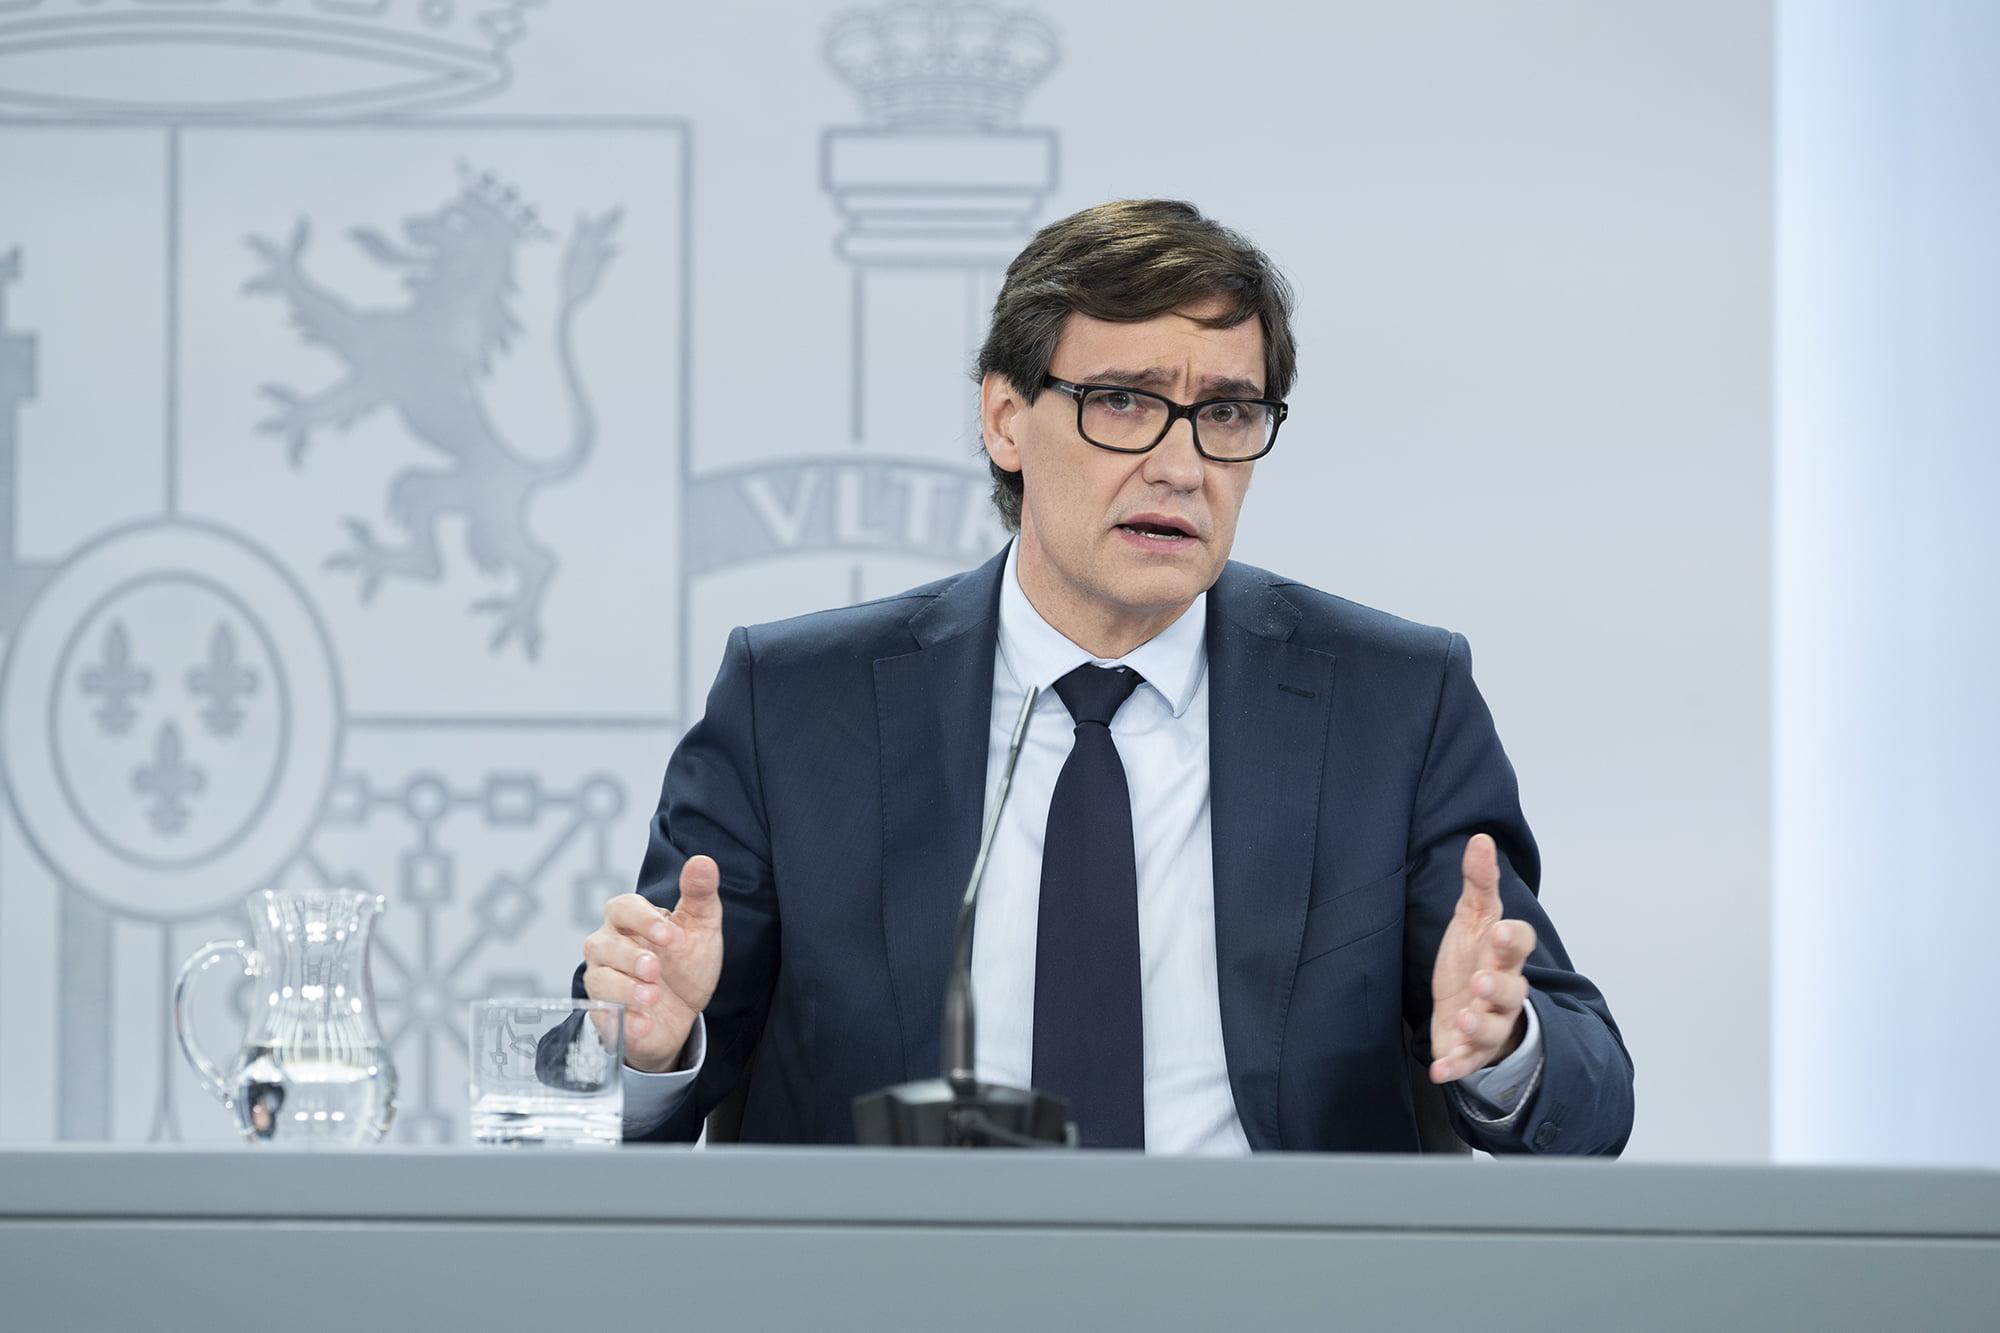 Salvador Illa, Minister of Health